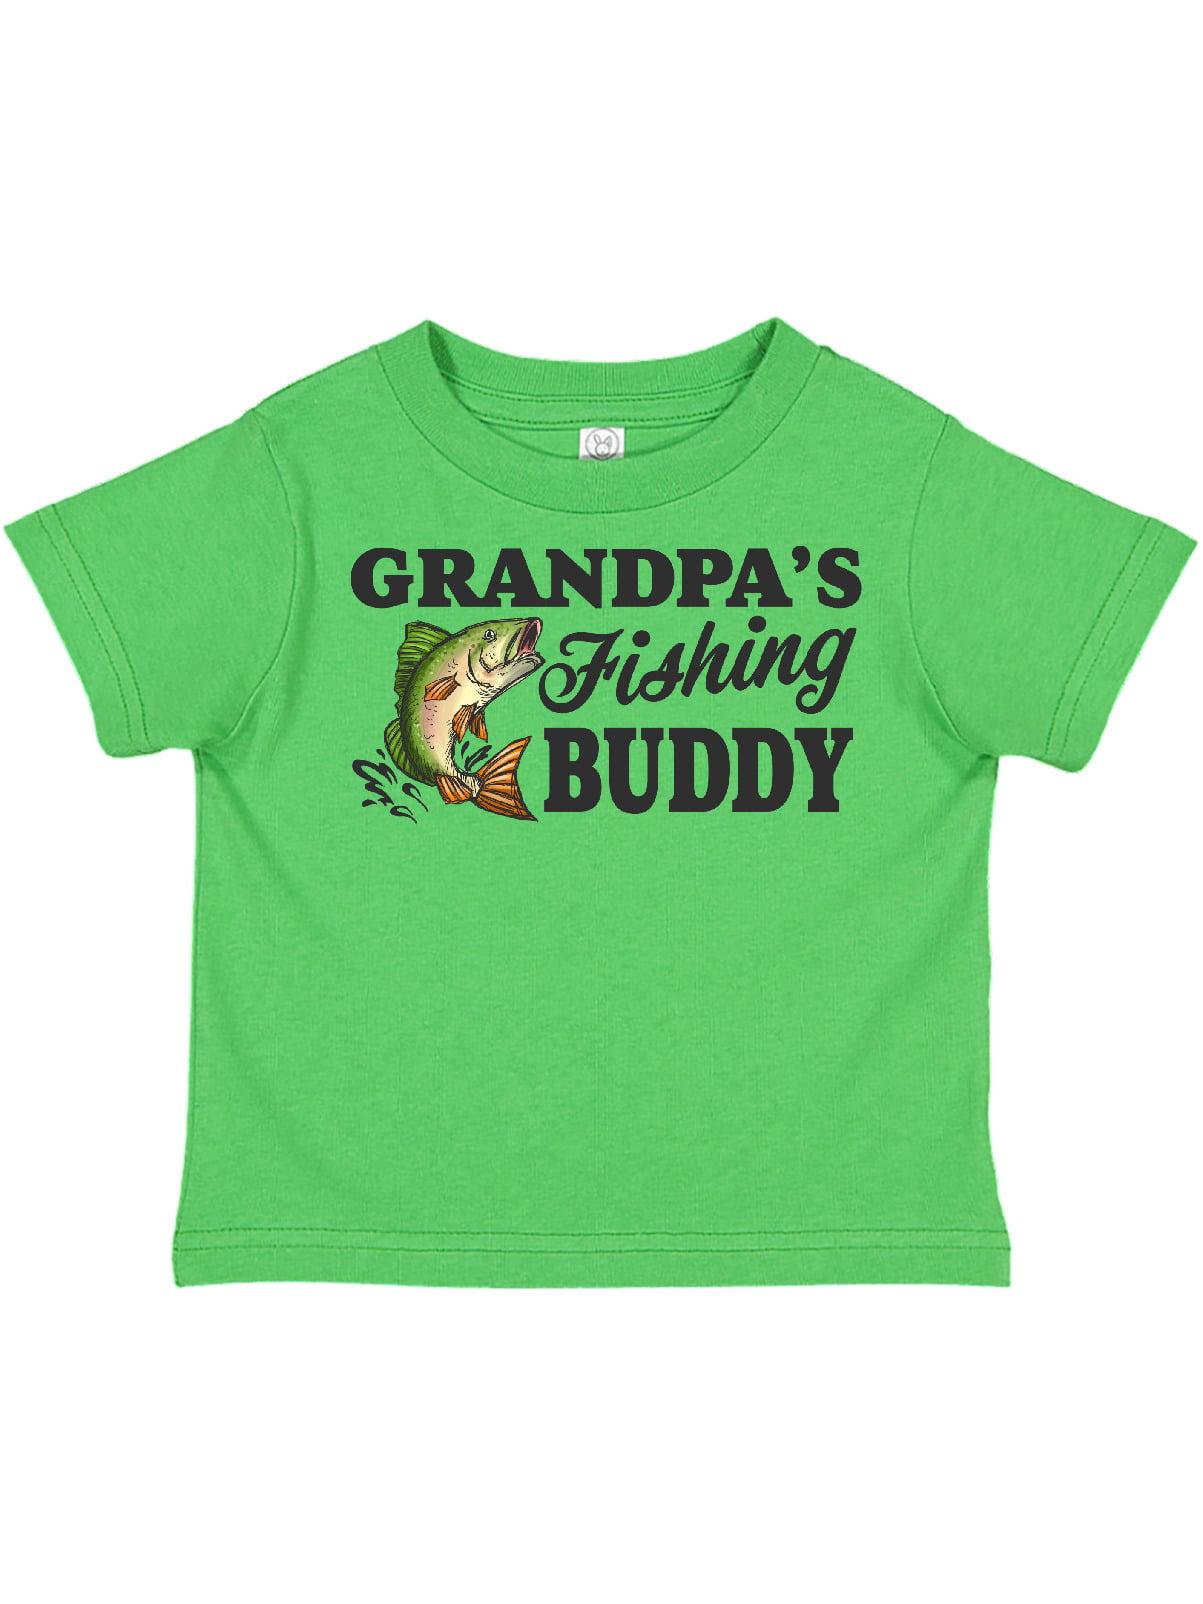 Grandpas Drinking Buddy Toddler Girls T Shirt Kids Cotton Short Sleeve Ruffle Tee